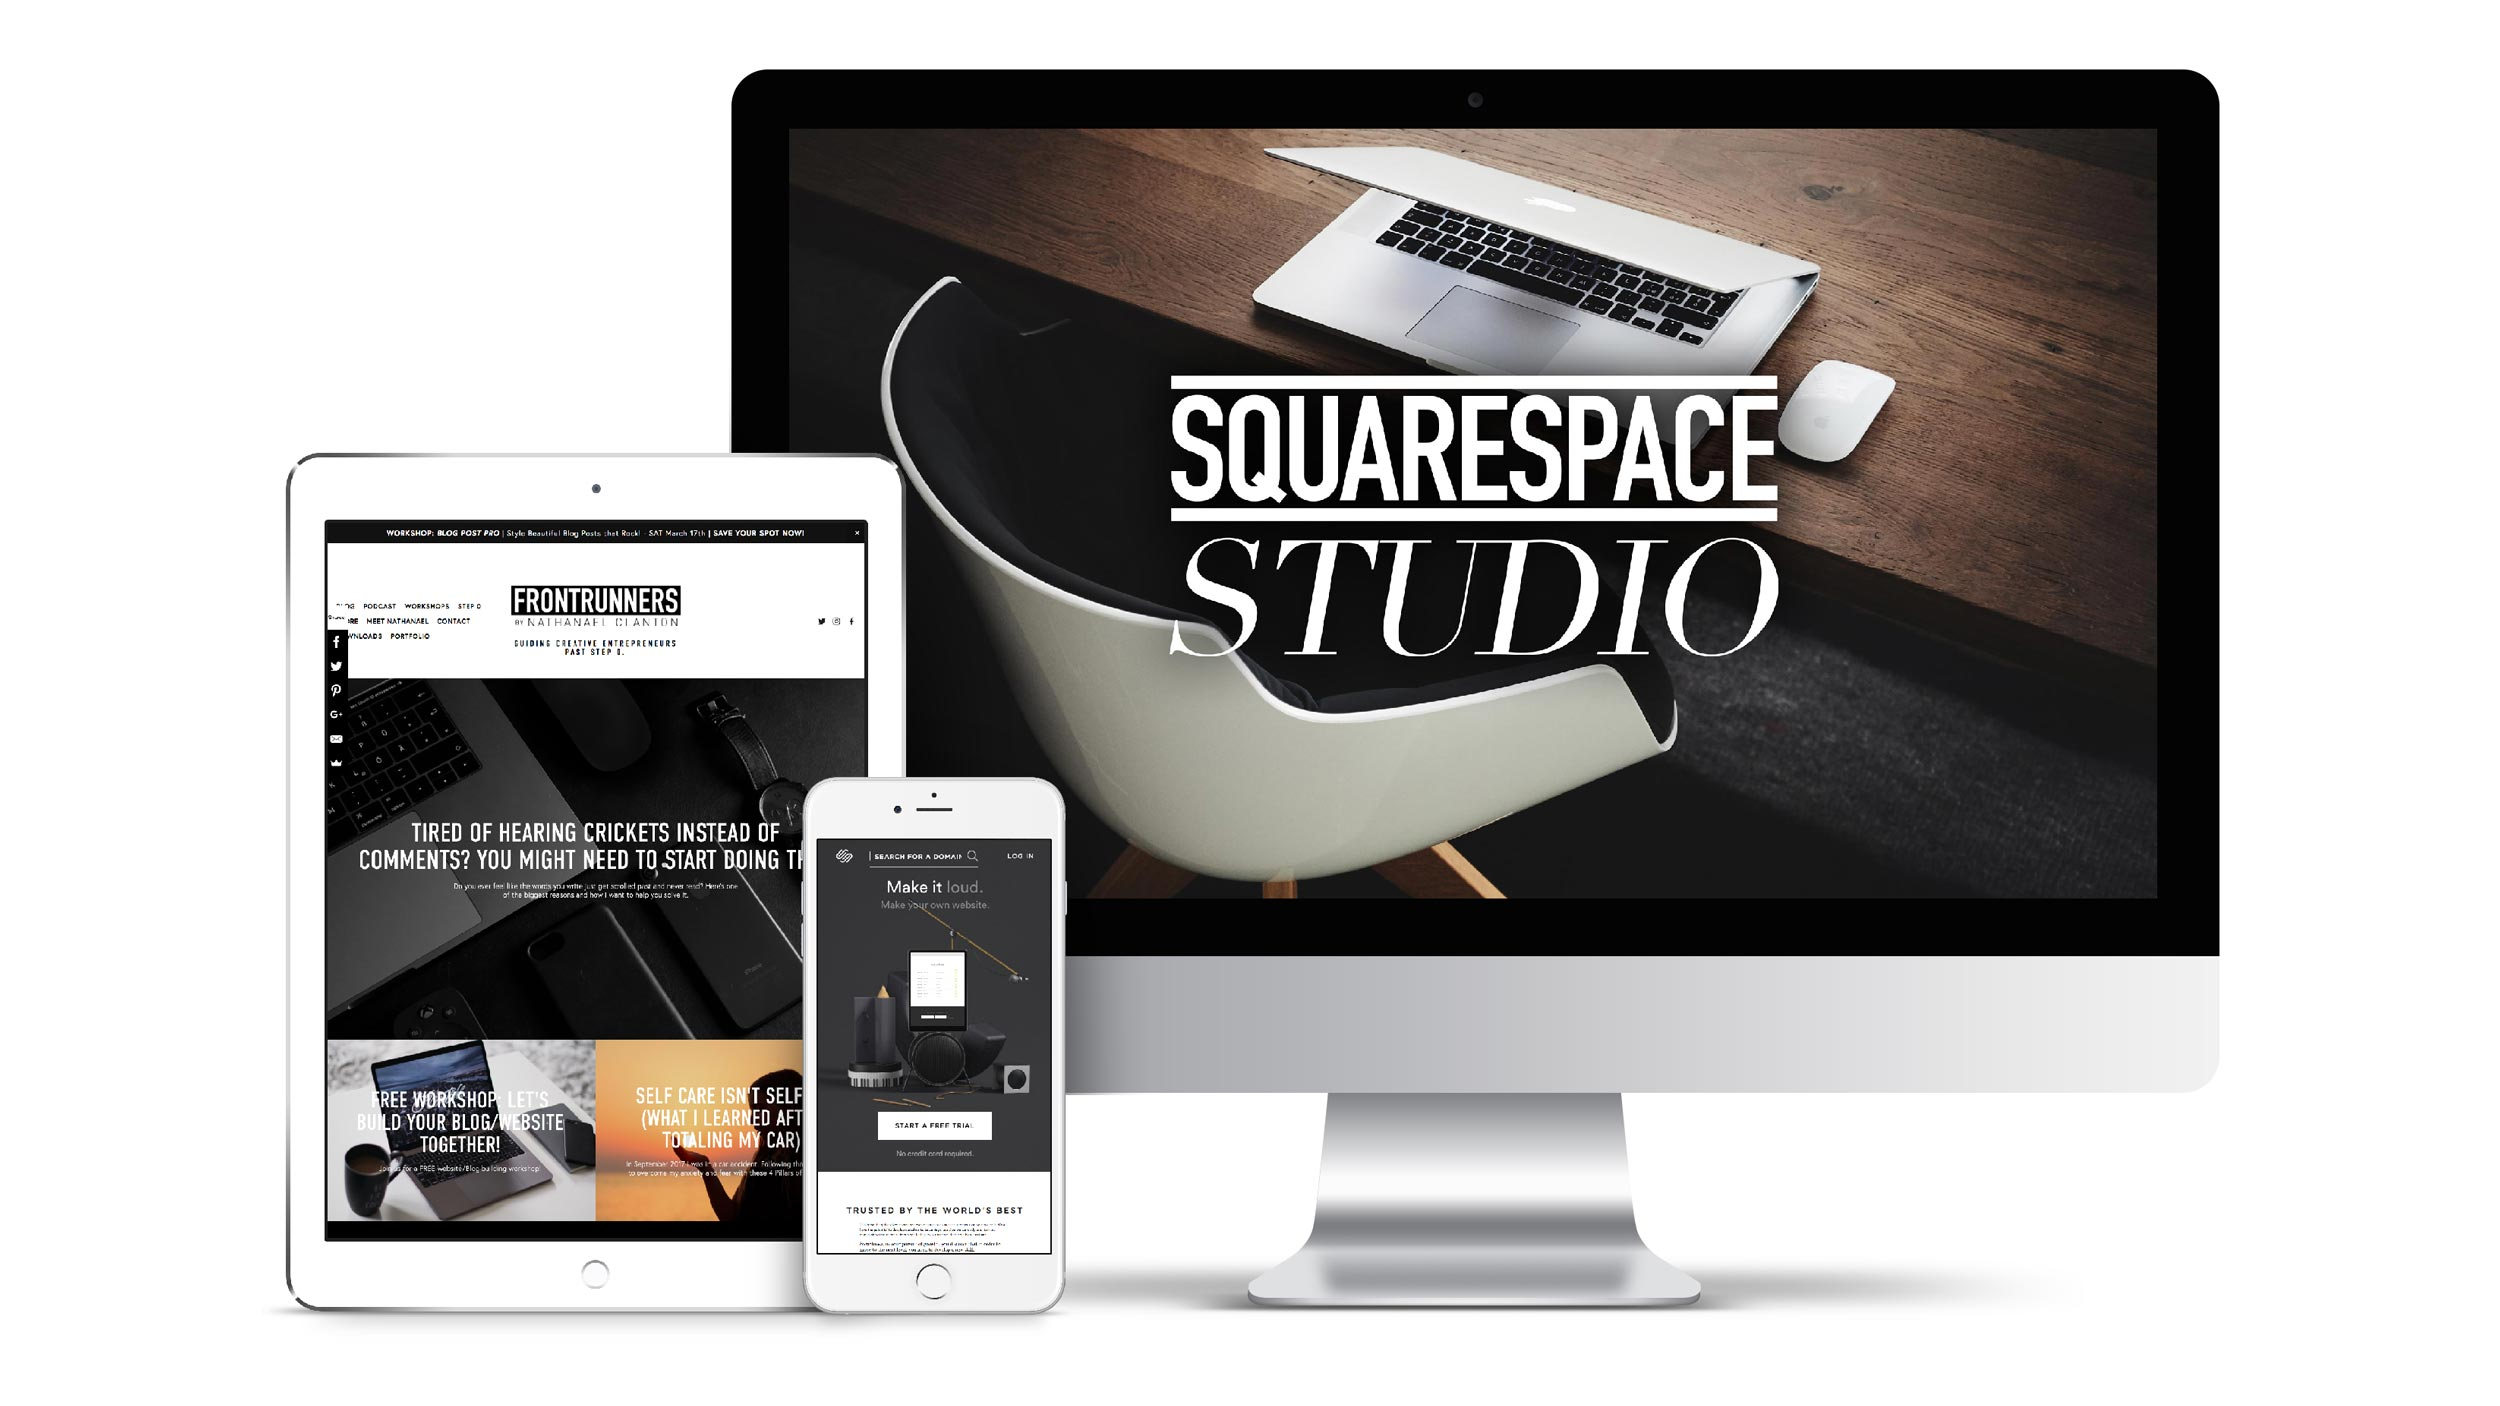 Squarespace-Studio-Apple-Devices1.jpg